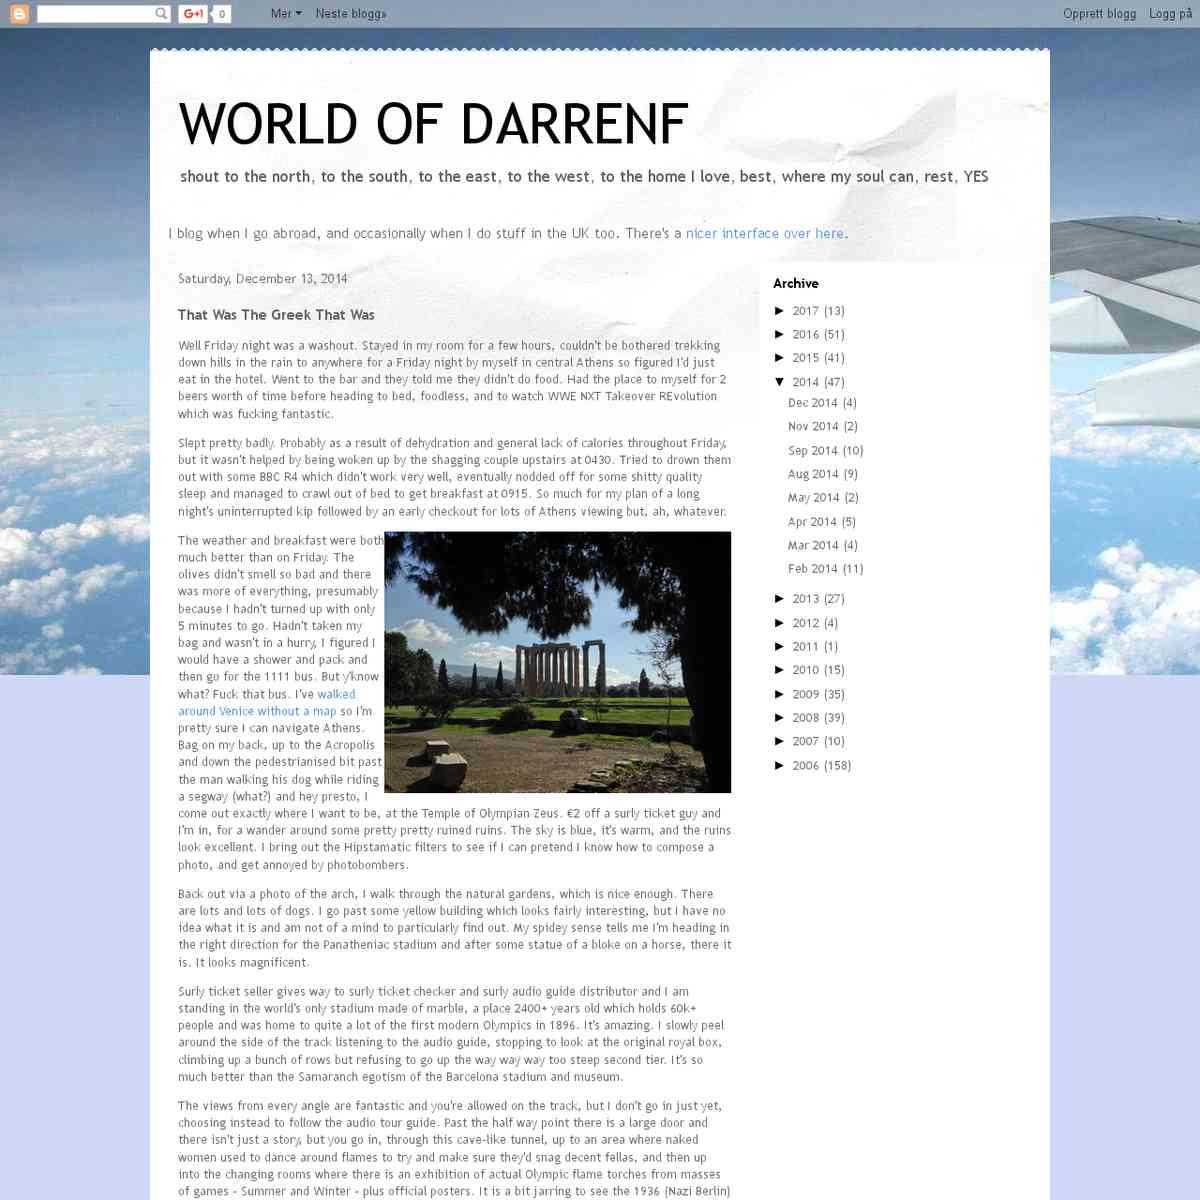 blog.darrenf.org/2014/12/that-was-greek-that-was.html